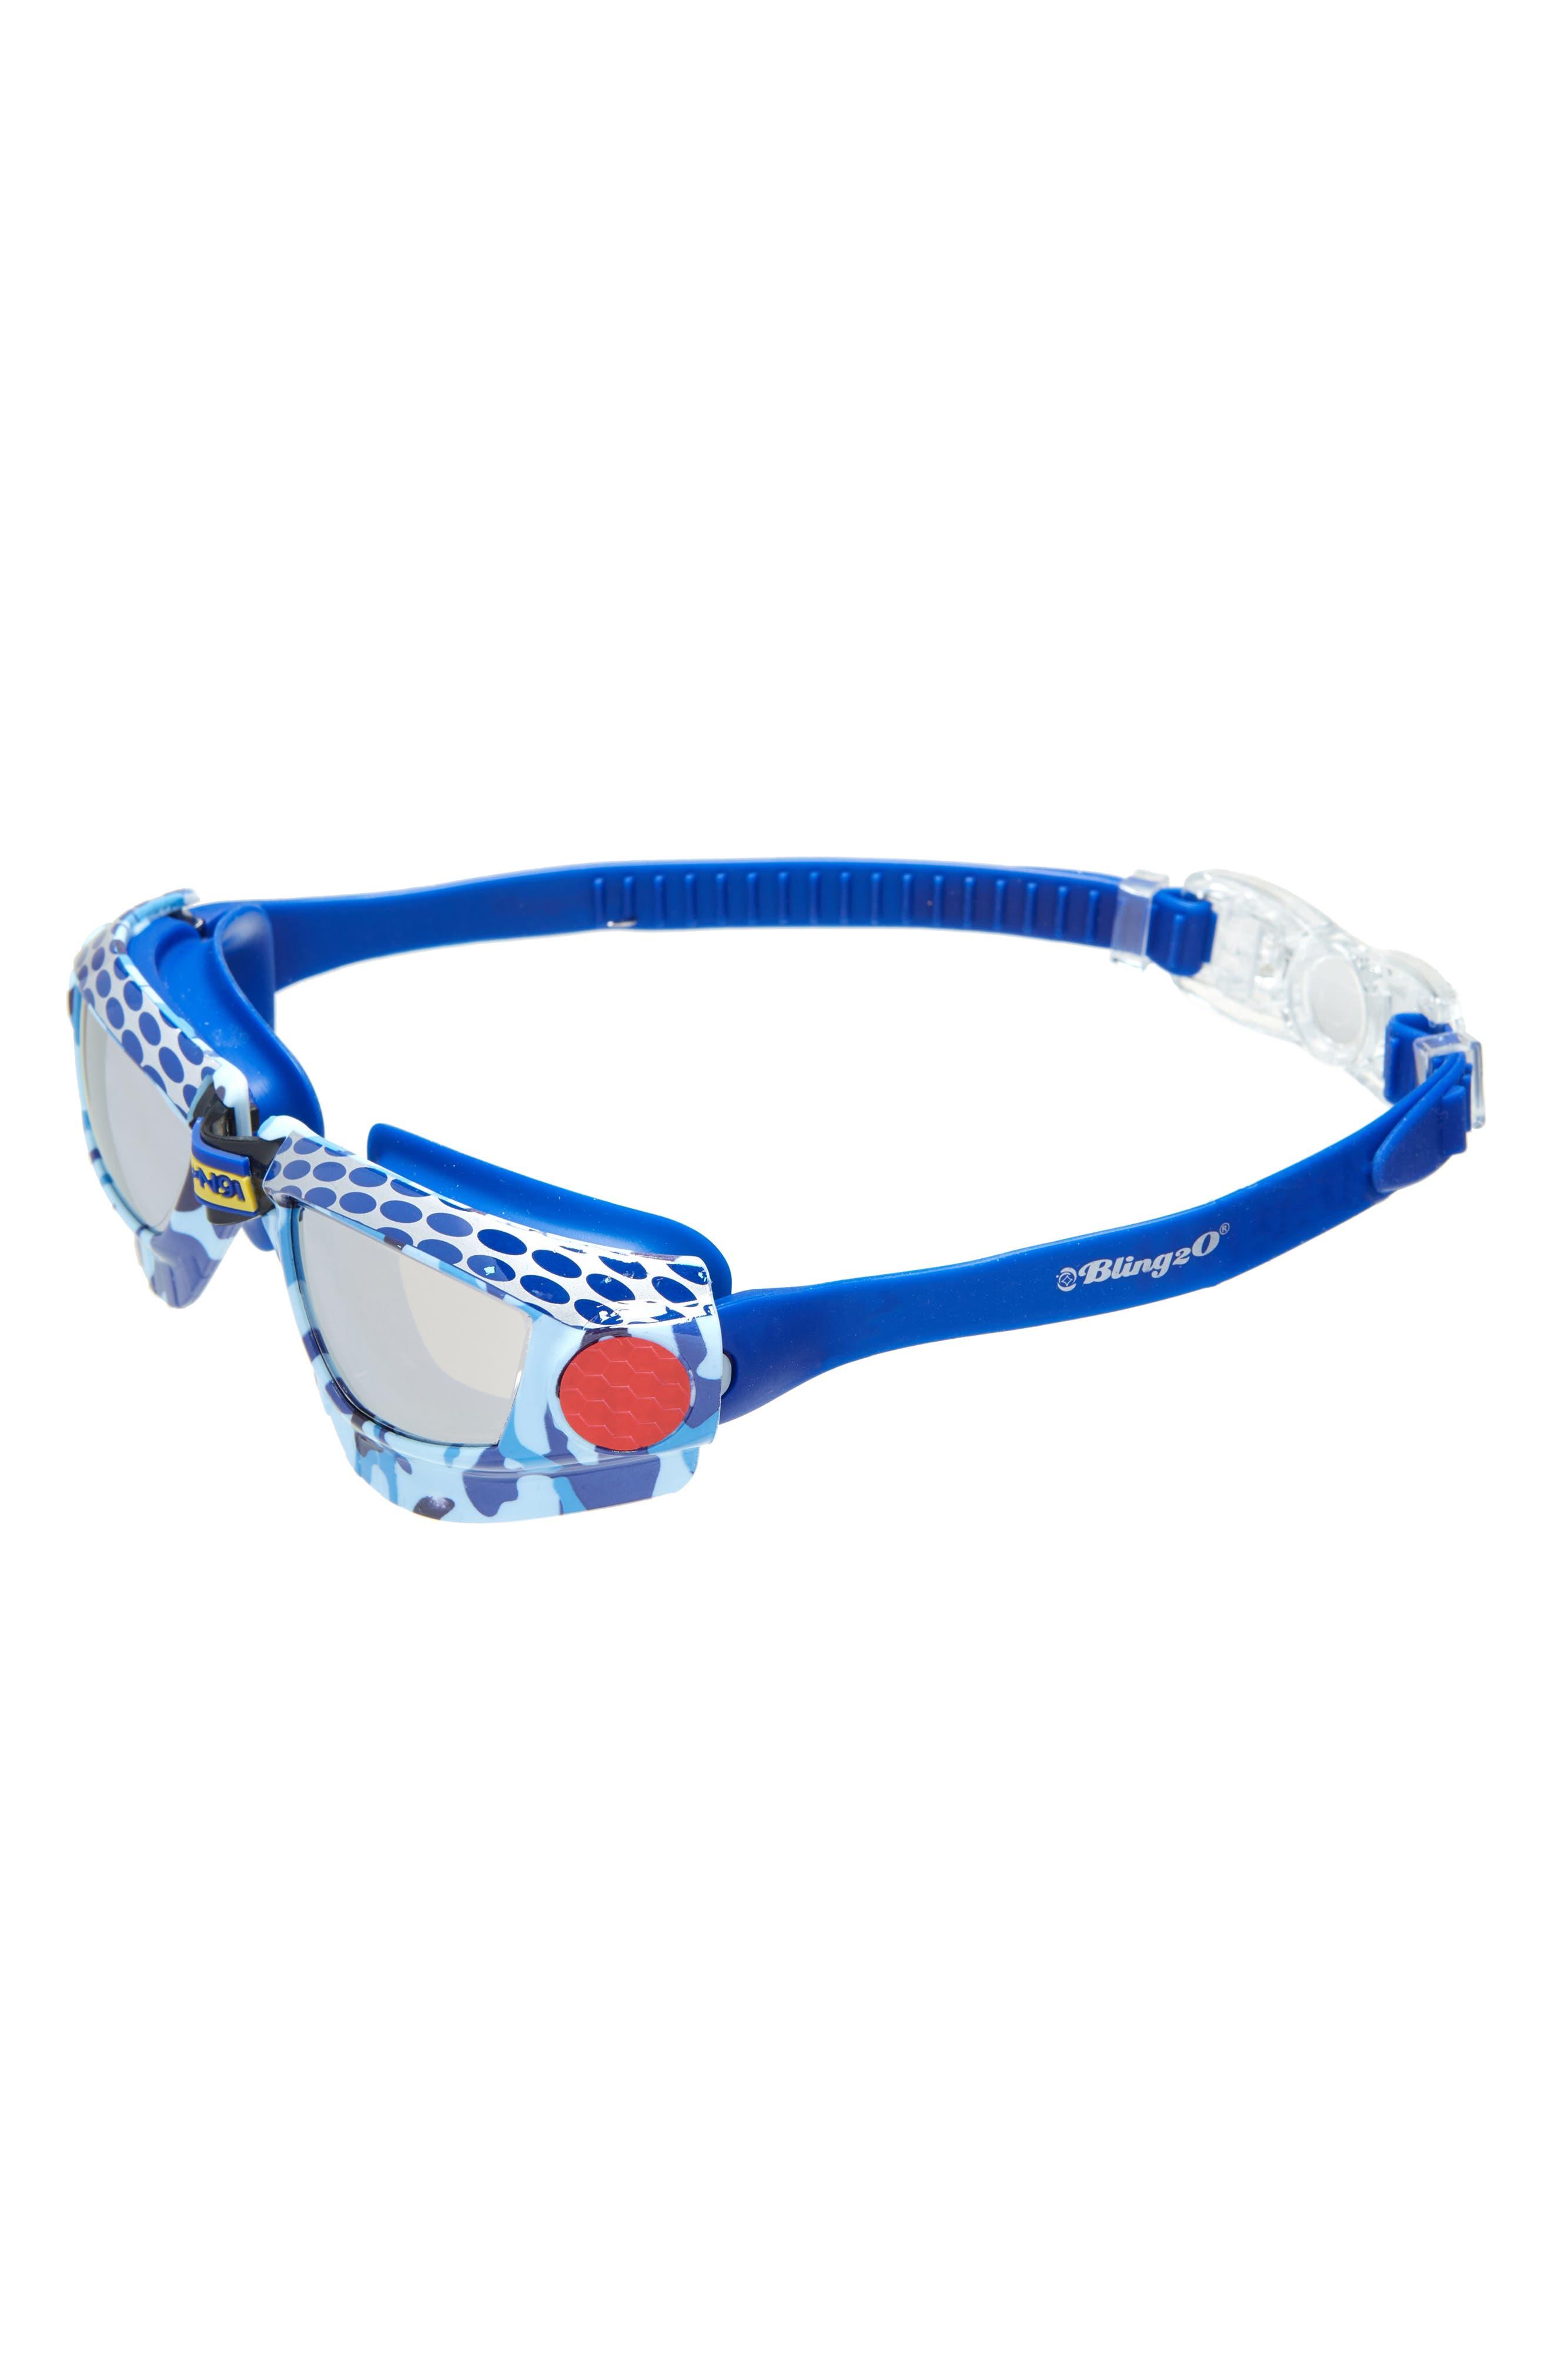 Mud Racer Swim Goggles,                         Main,                         color, 400